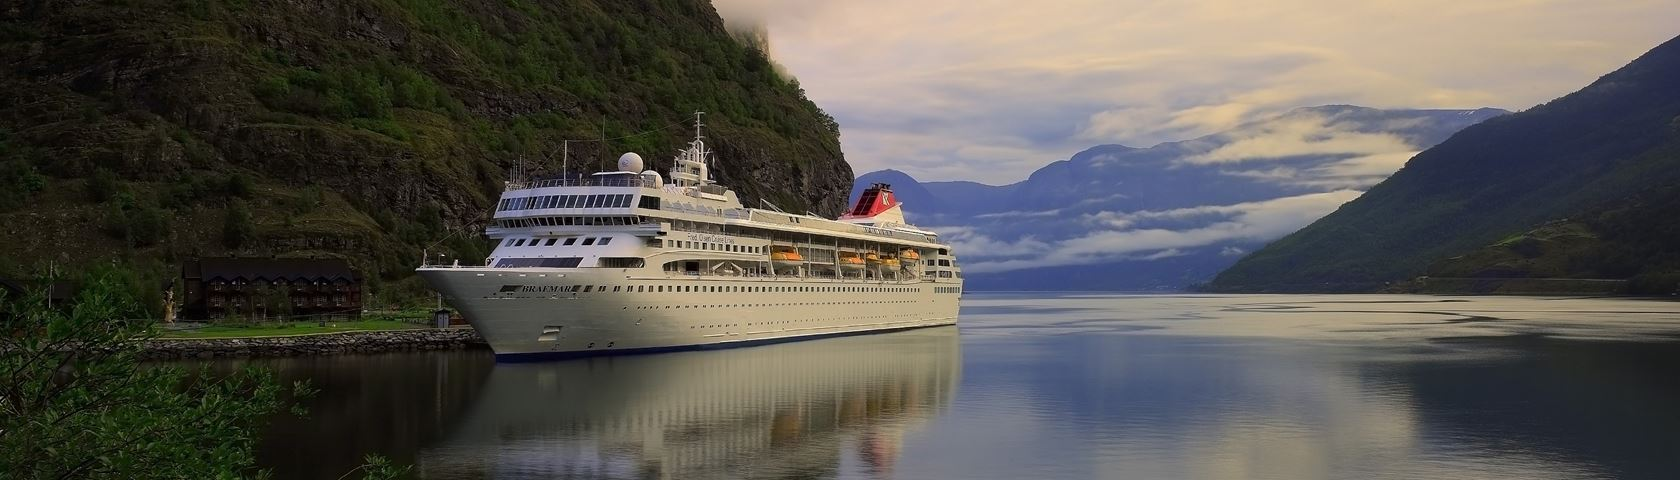 Cruising a Fjord